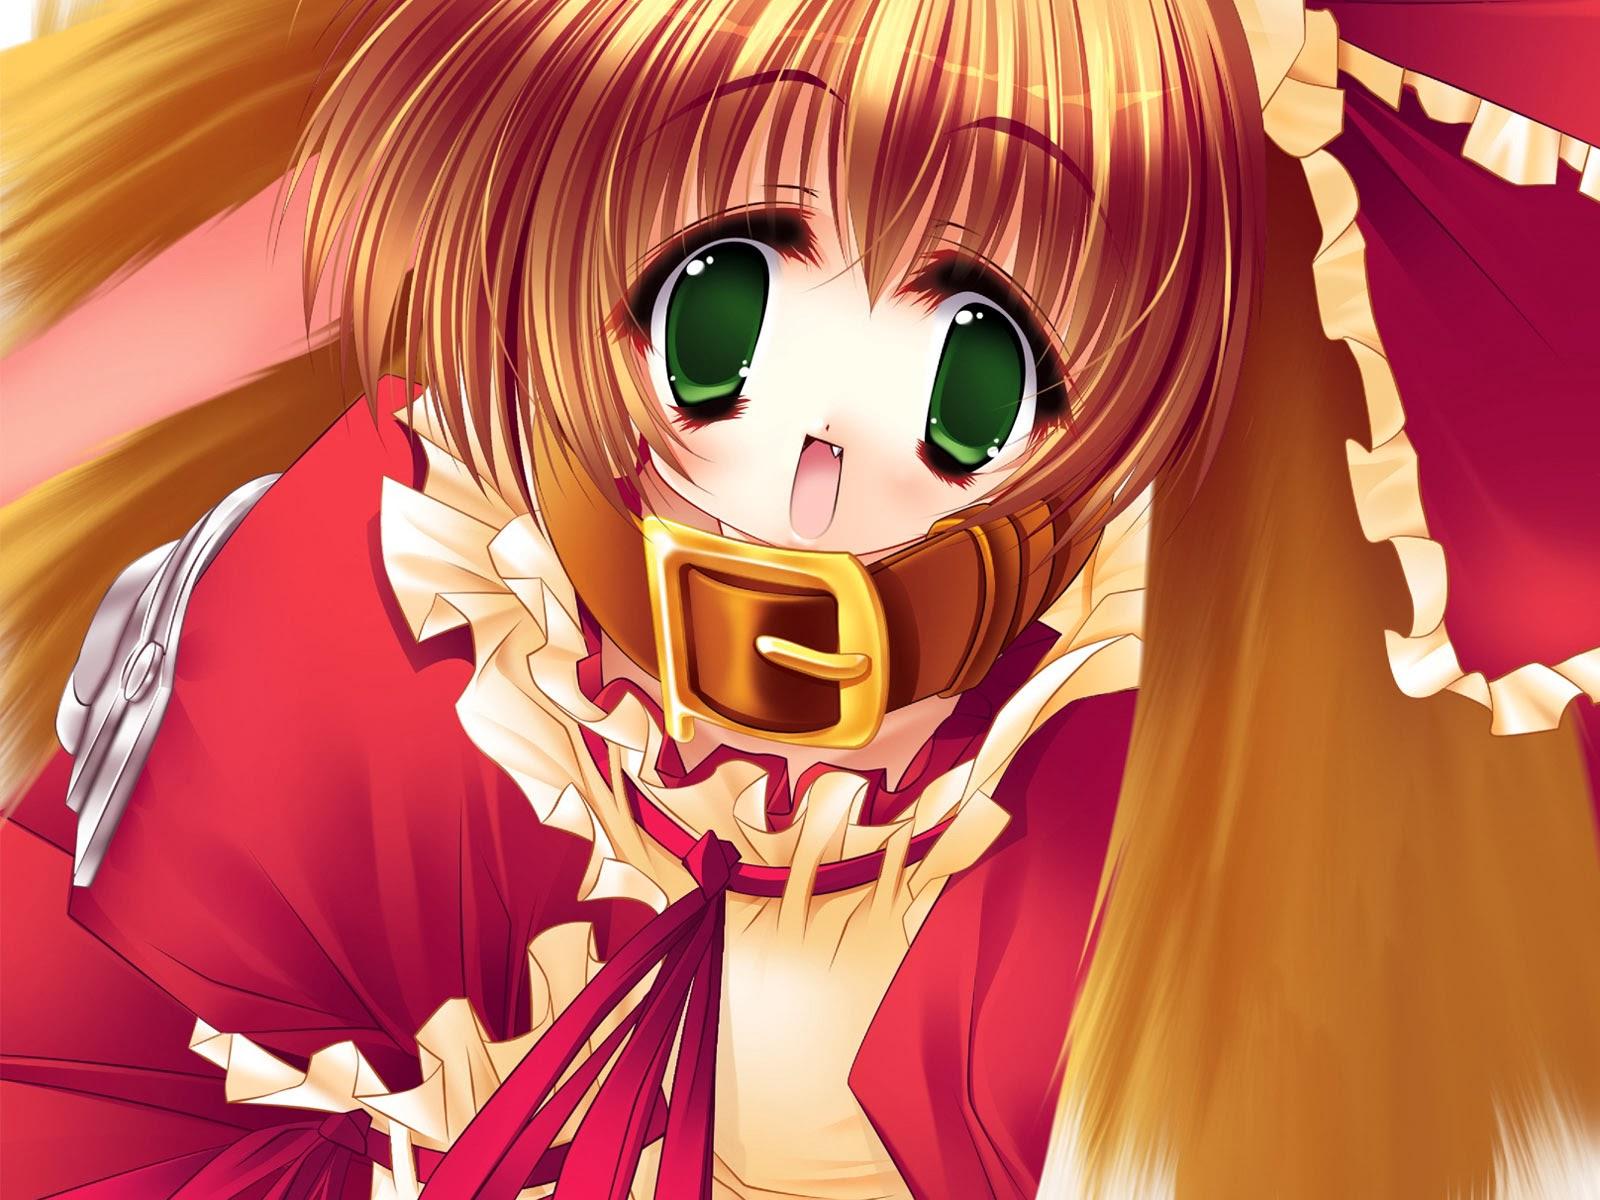 "<img src=""http://2.bp.blogspot.com/-qjSdMYcbdhE/Utu0dpODp5I/AAAAAAAAJBI/kcly7YrRZBQ/s1600/cute-anime-girl.jpg"" alt=""cute anime girl"" />"